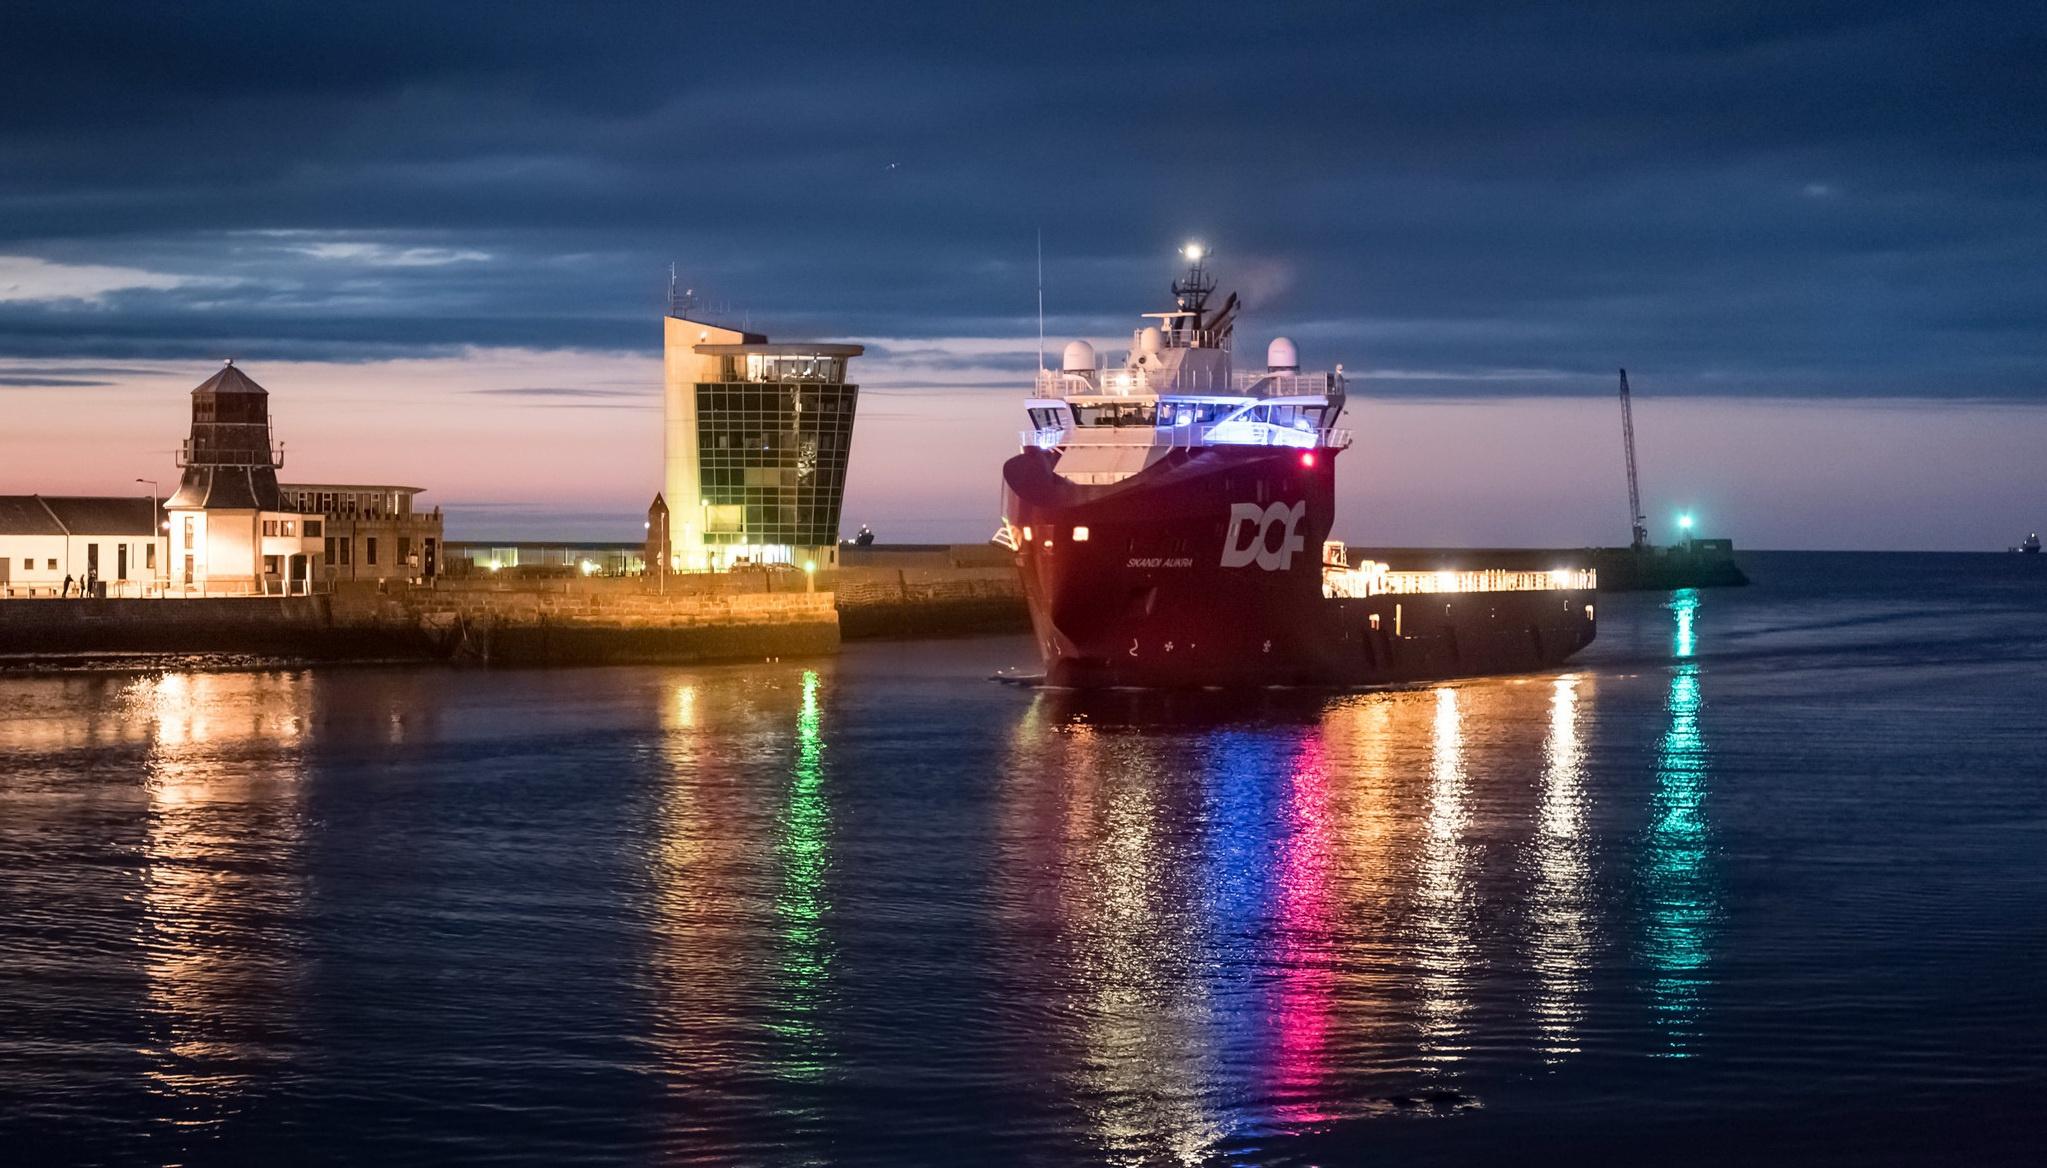 Scotland Aberdeen City Harbor Ship Vehicle 2047x1168